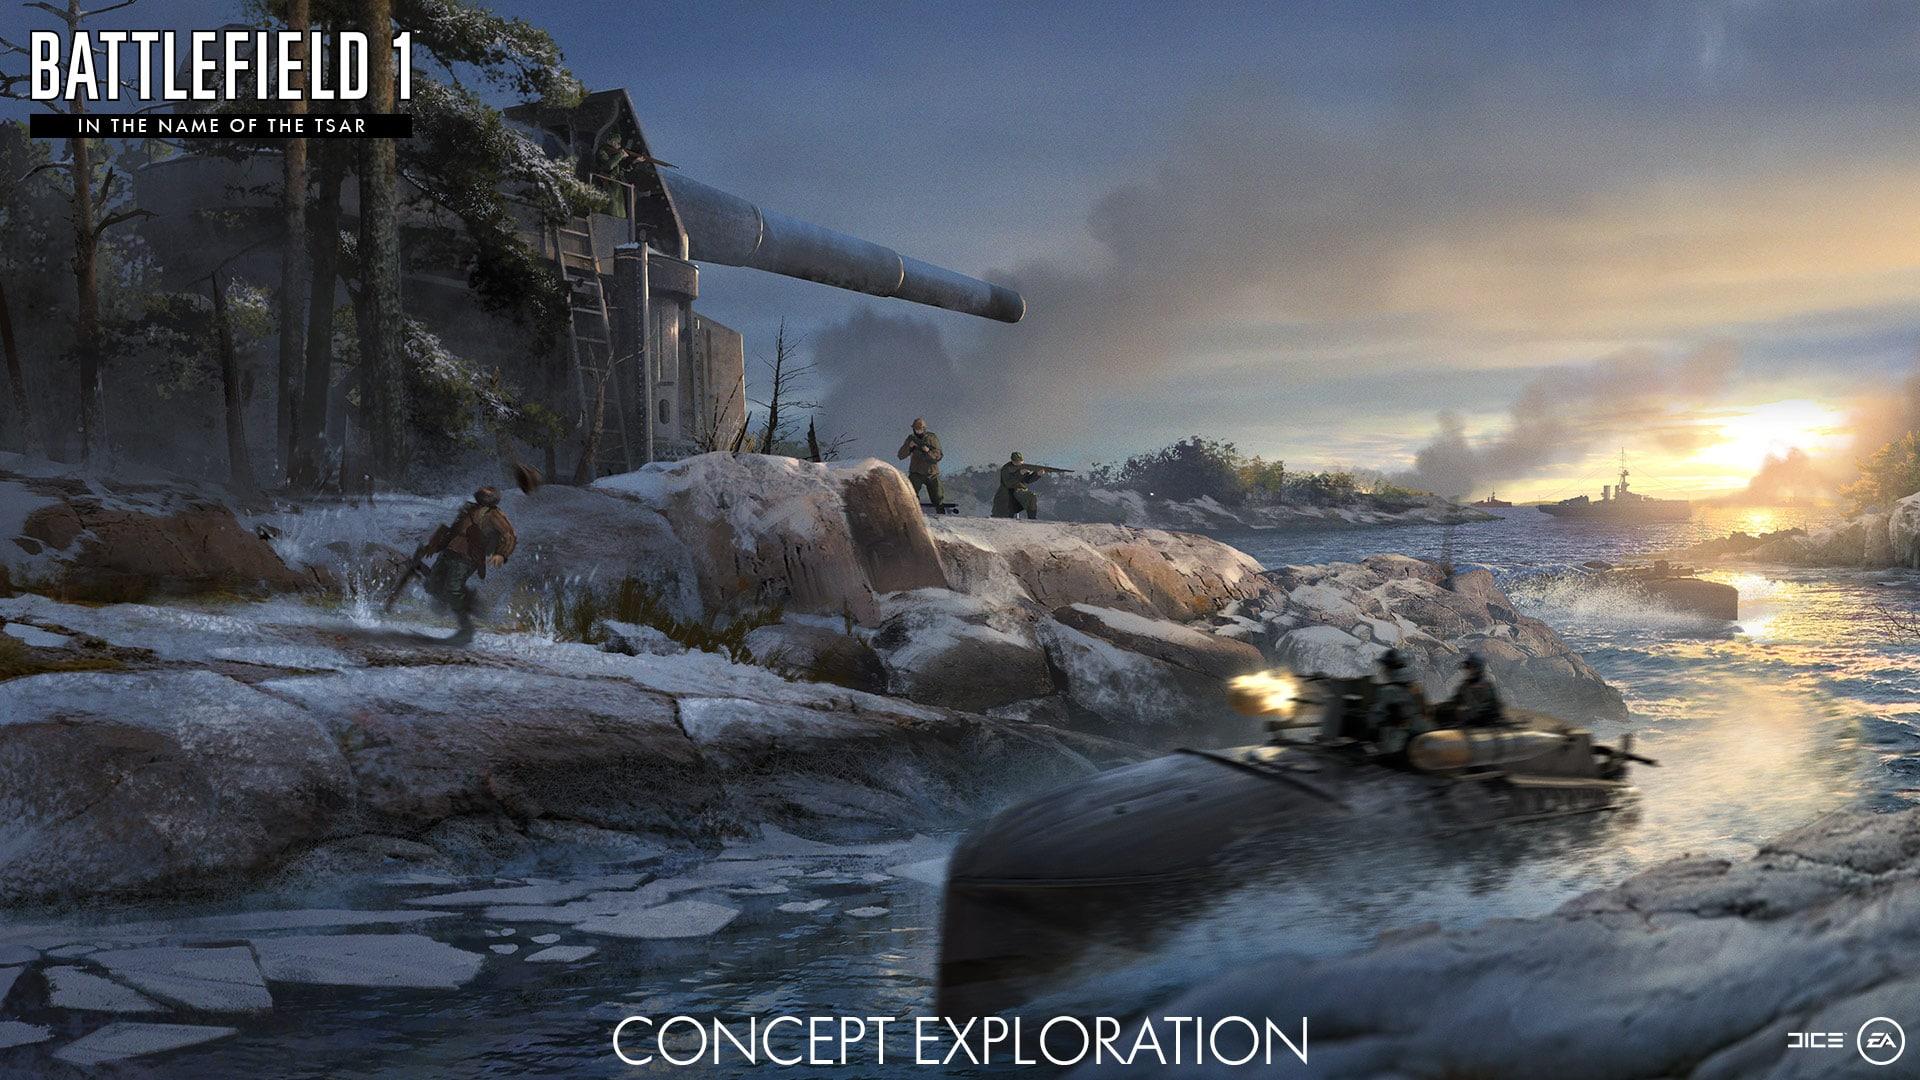 Battlefield-1-In-The-Name-Of-The-Tsar-Concept-Art3.jpg